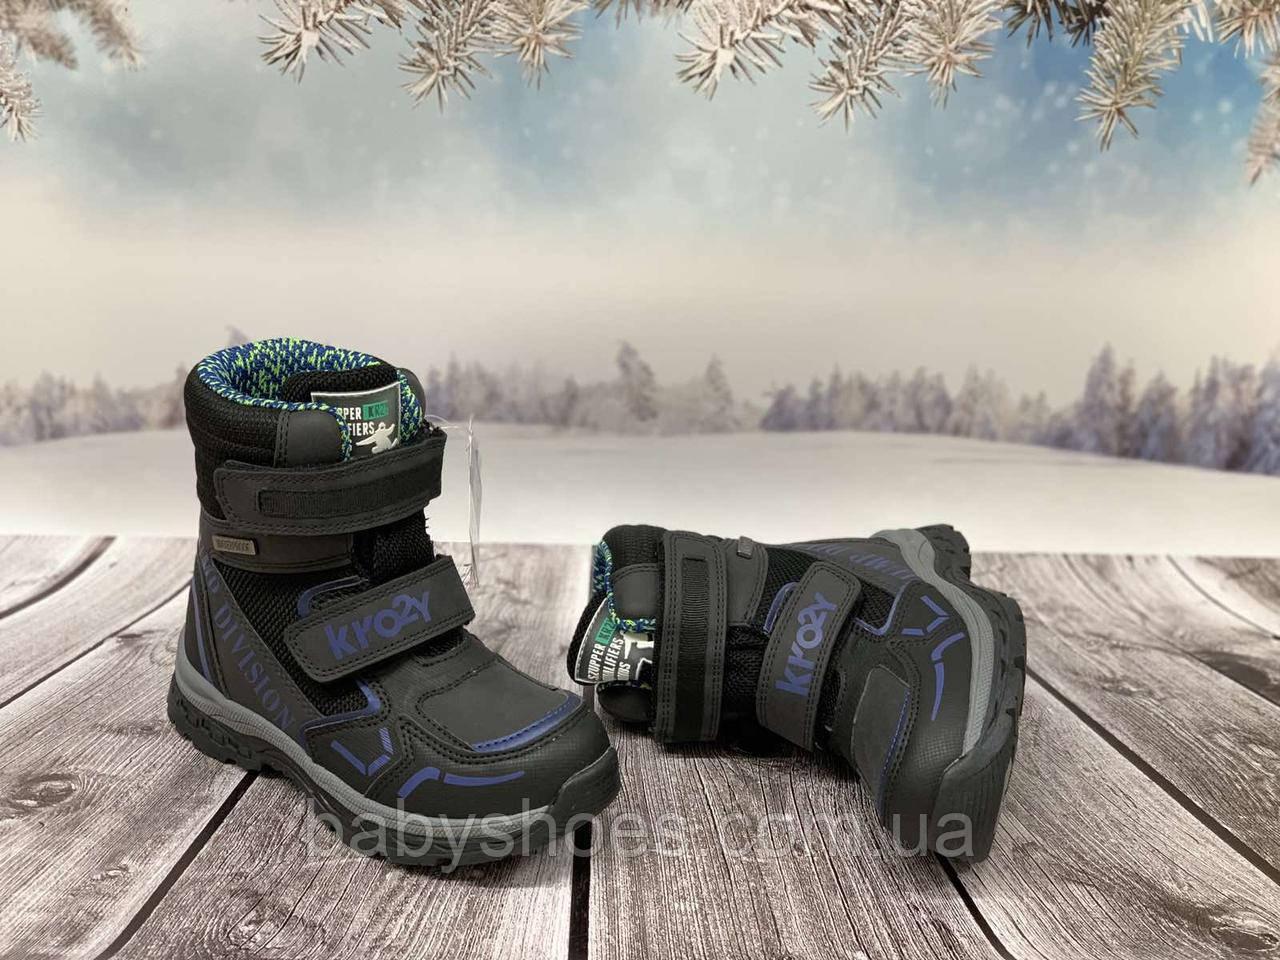 Зимние термо-ботинки, сноубутсы для мальчика Krokky мембрана. р.32, 38, мод.80306